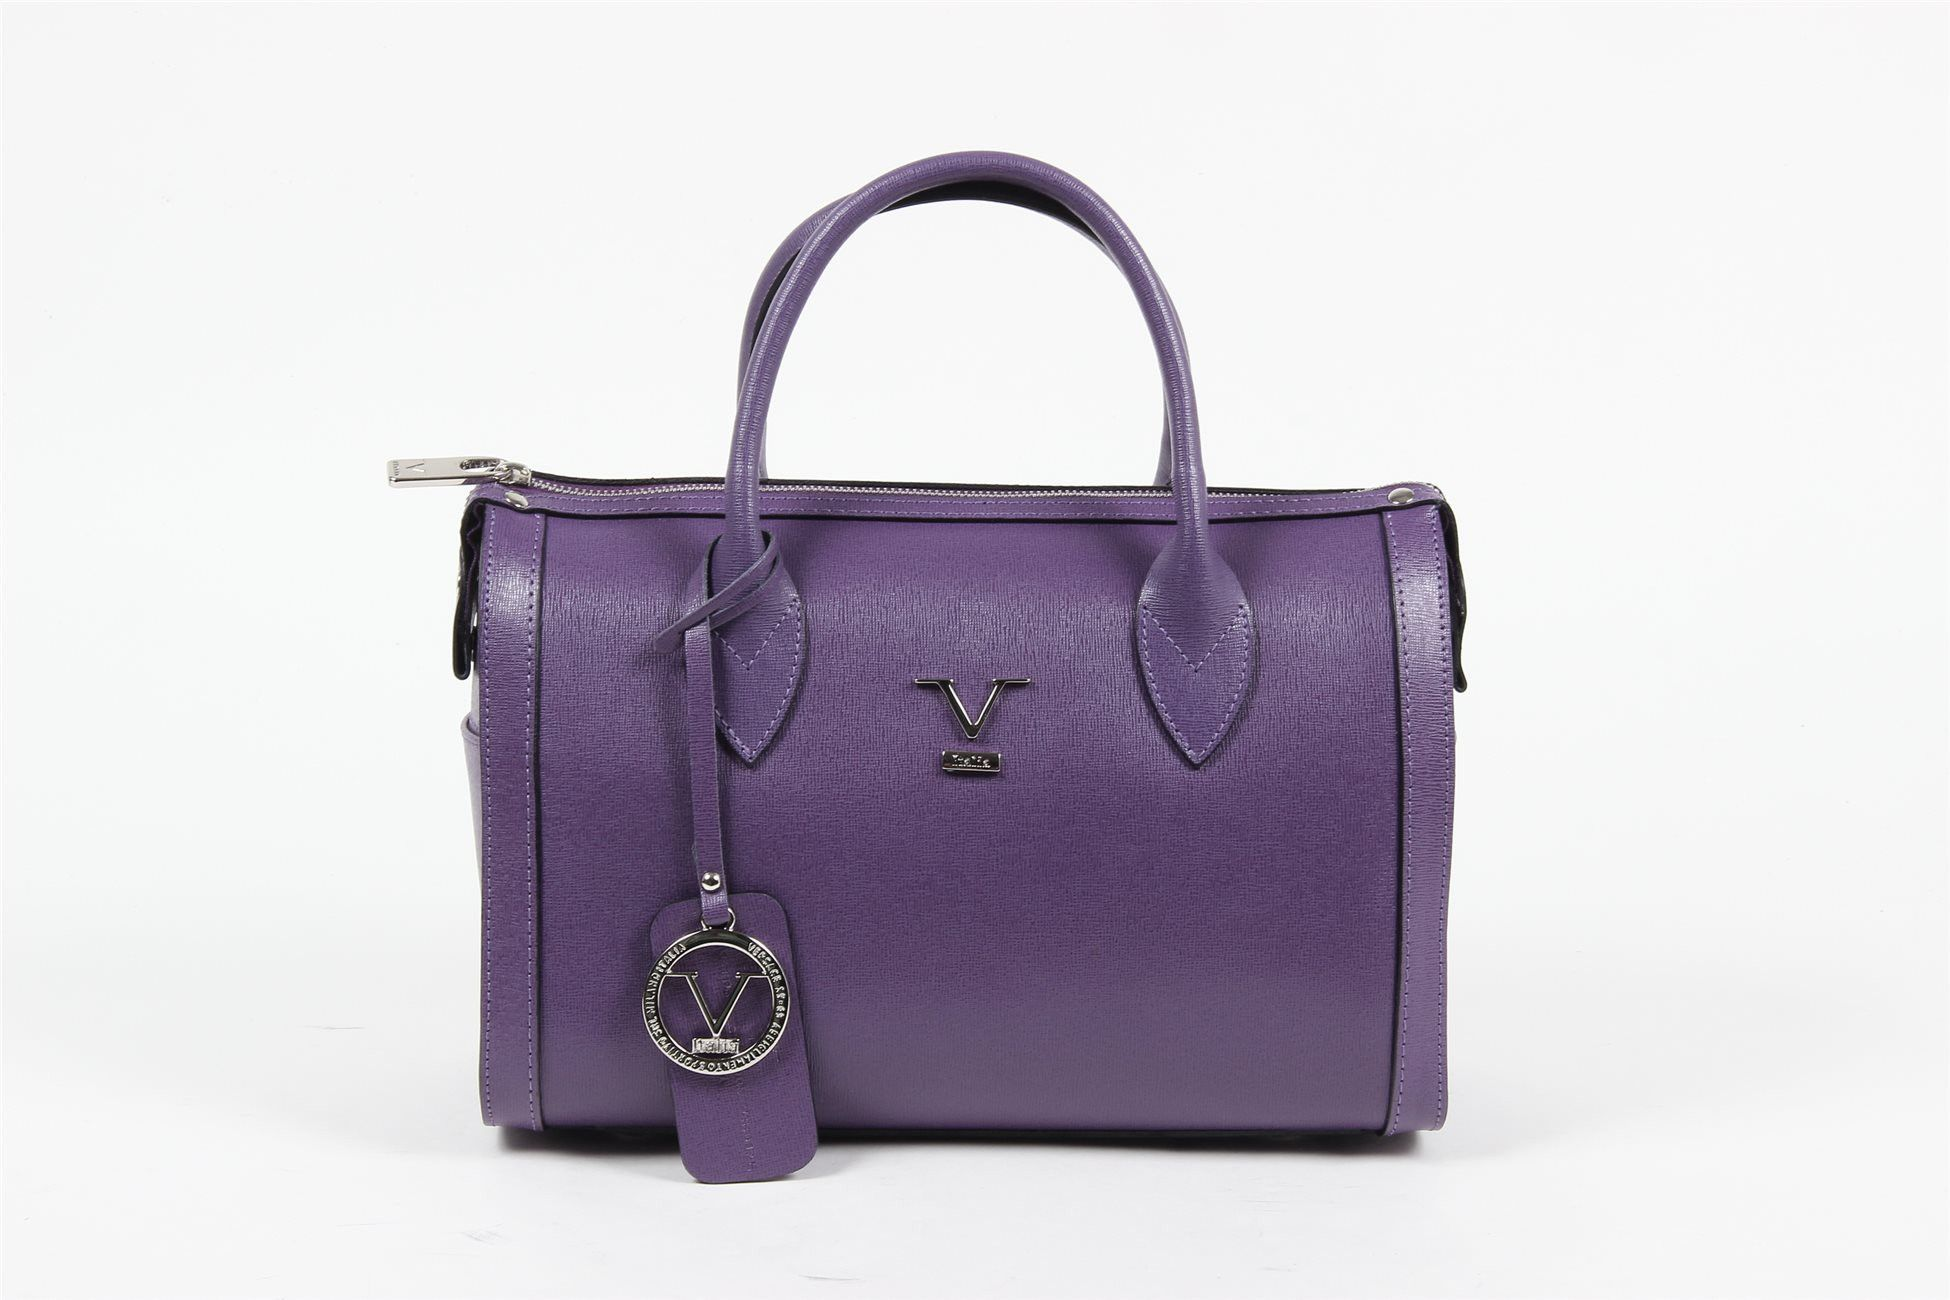 90922c45dee1 Versace 19.69 Abbigliamento Sportivo Srl Milano Italia Womens Handbag V014  S PURPLE